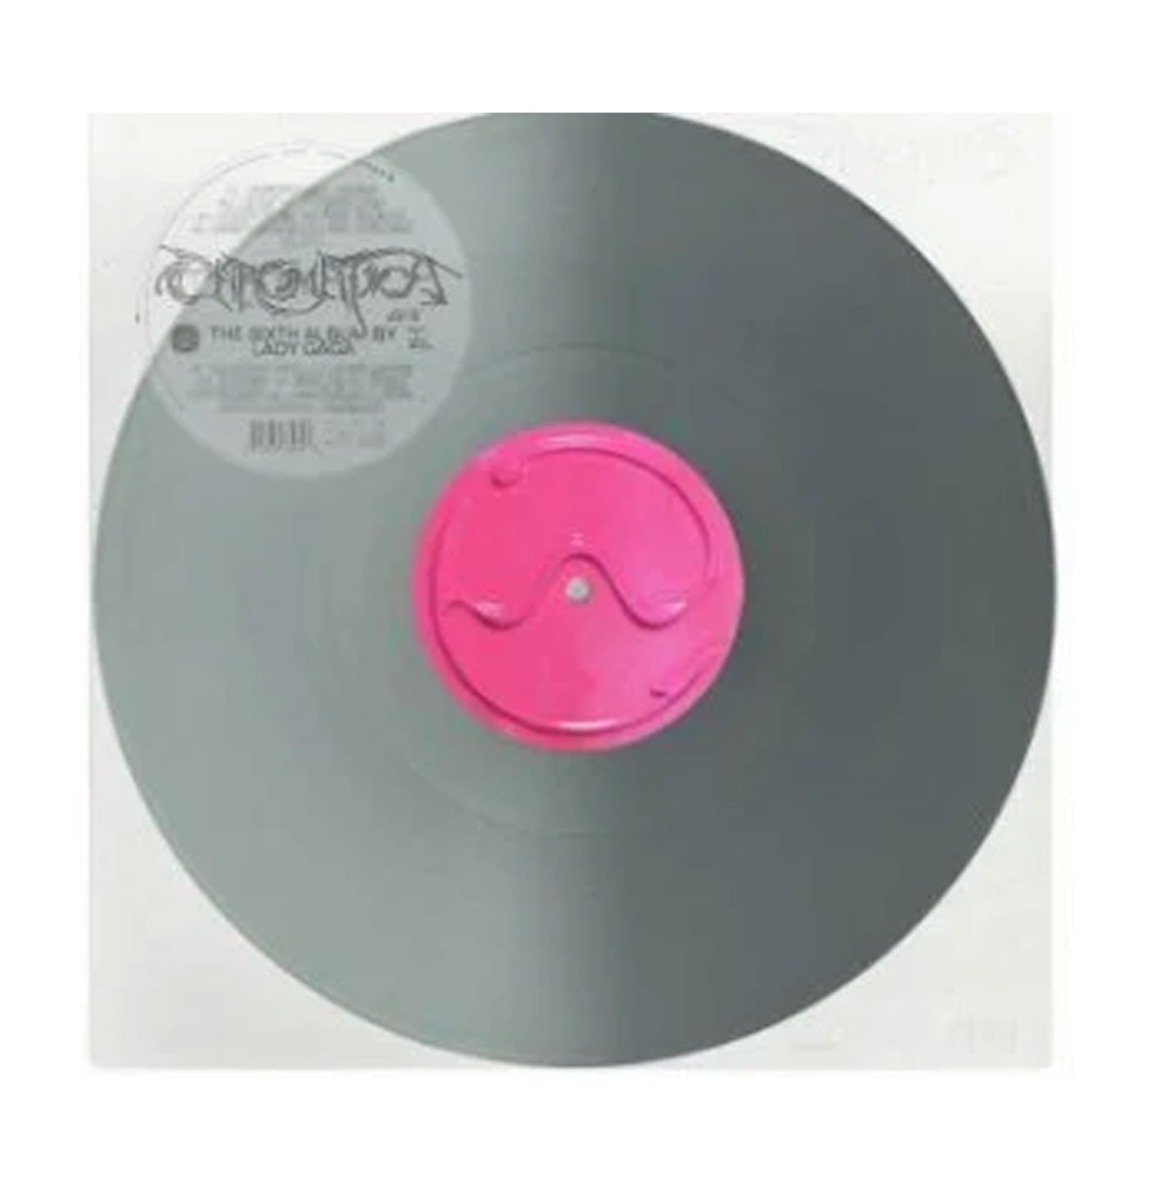 Lady Gaga - Chromatica LP -Silver Vinyl-